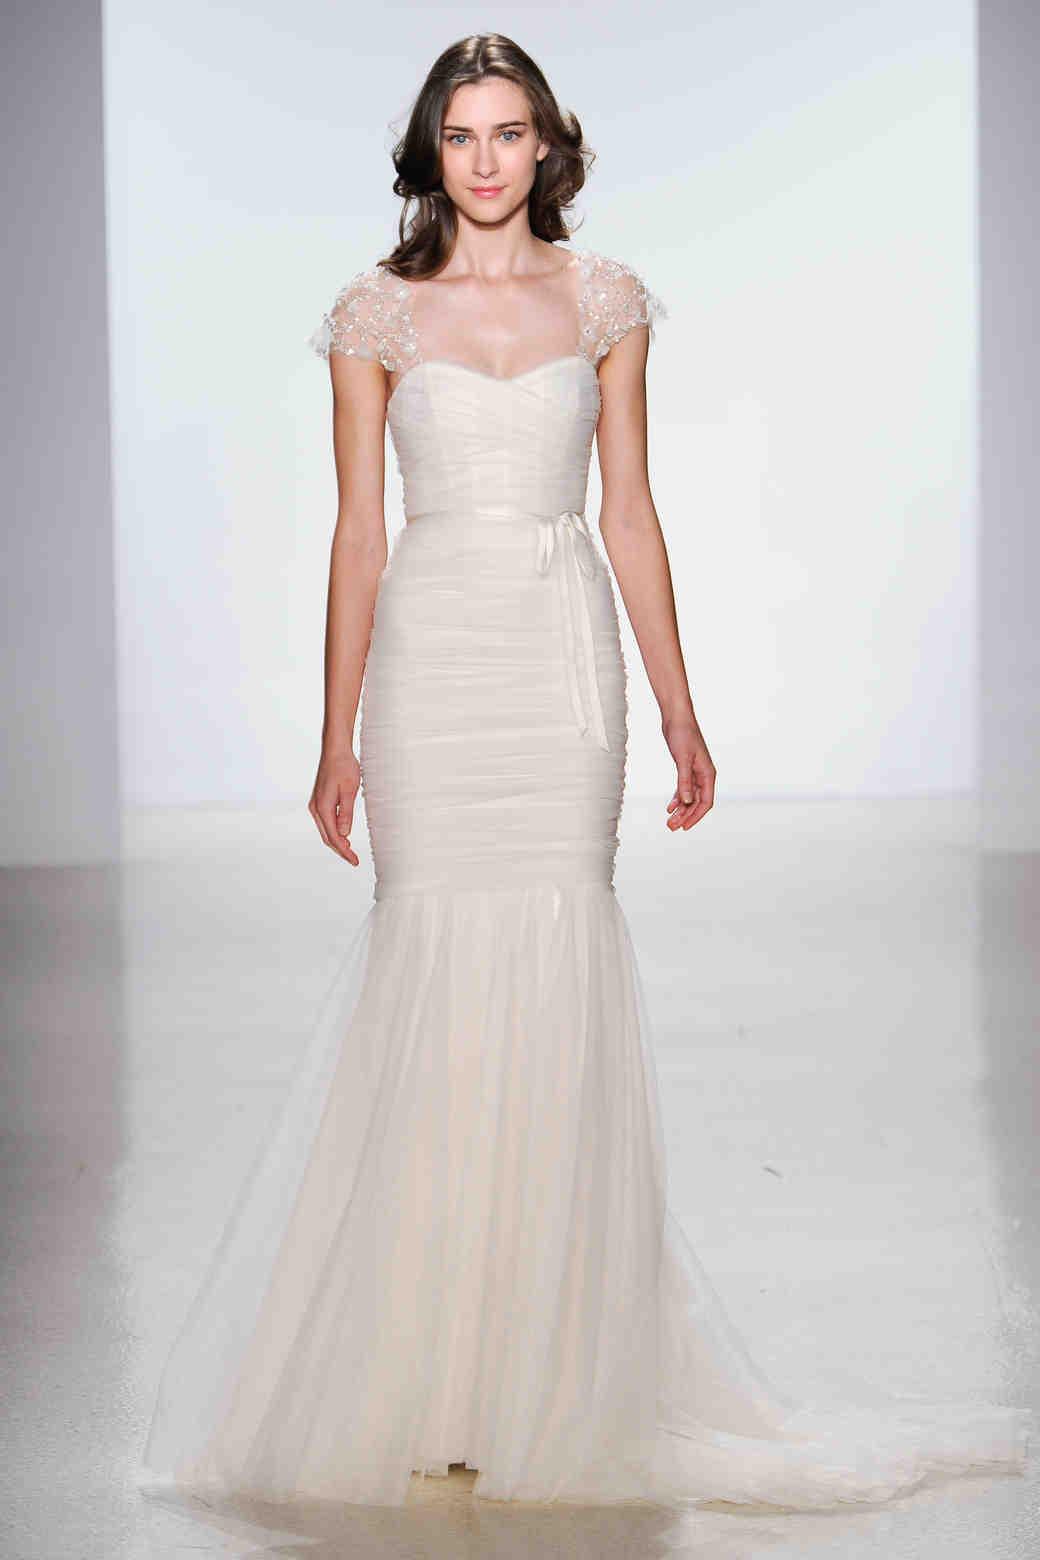 cap sleeve wedding dresses spring wedding dress cap sleeves Charming Caps